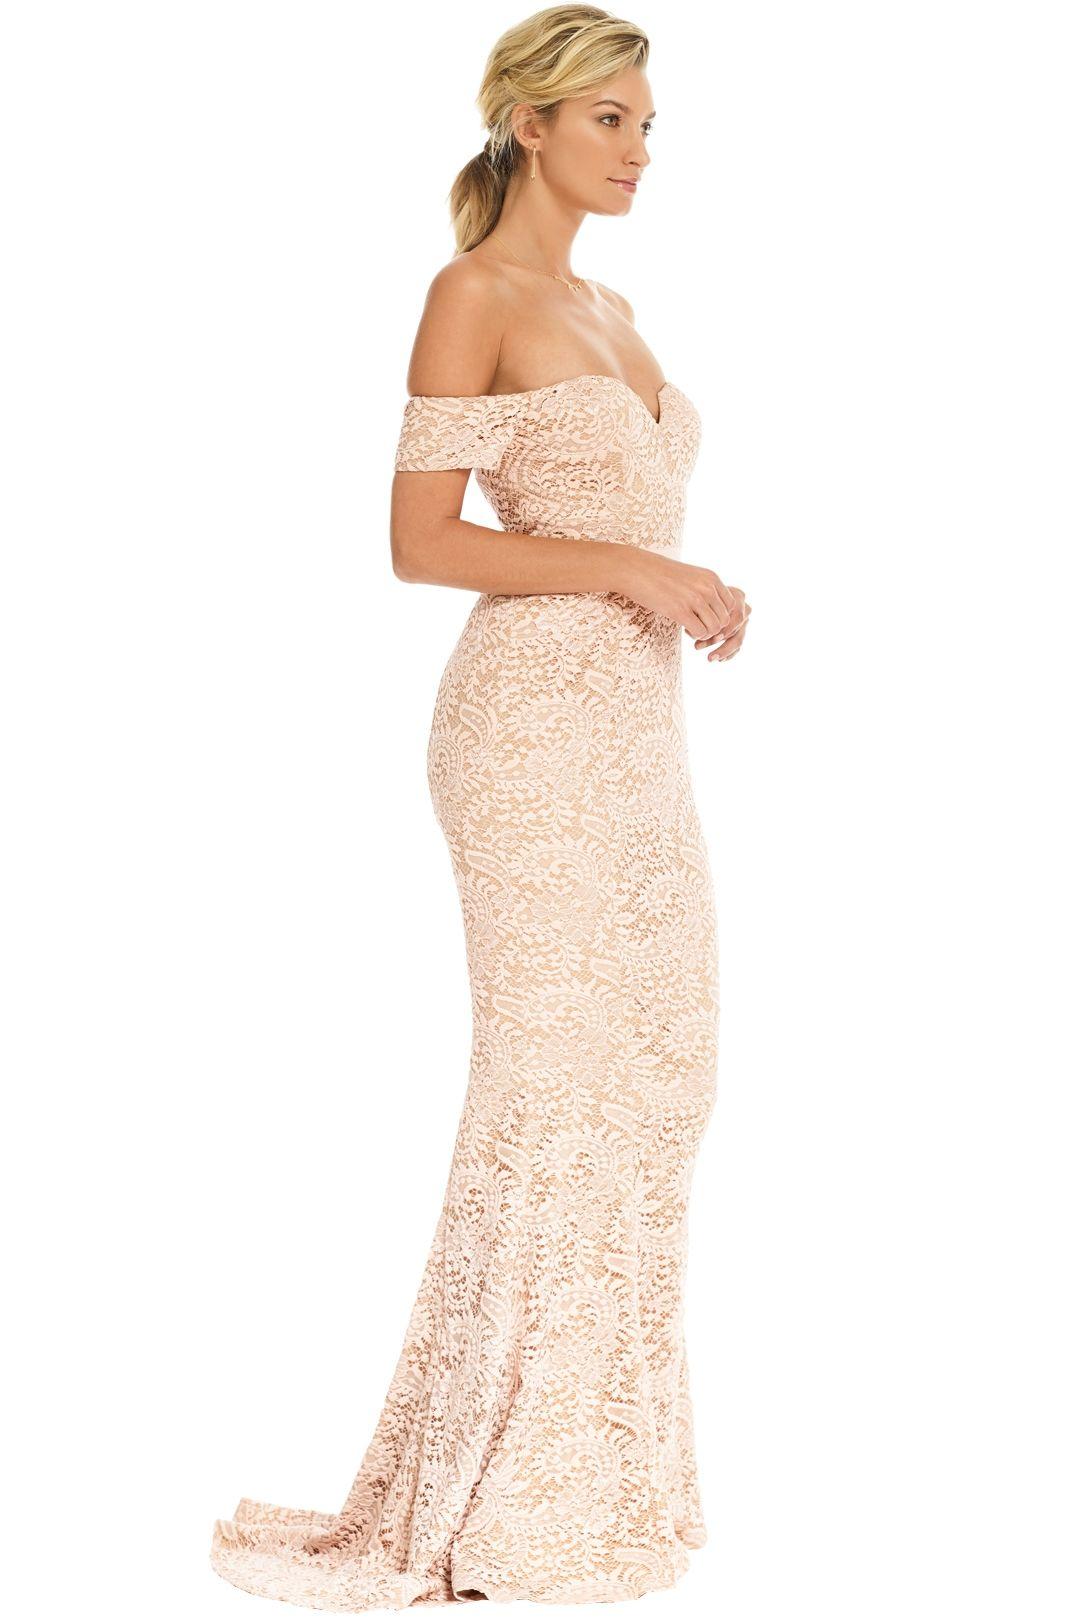 Elle Zeitoune - Carina Dress - Blush Nude - Side